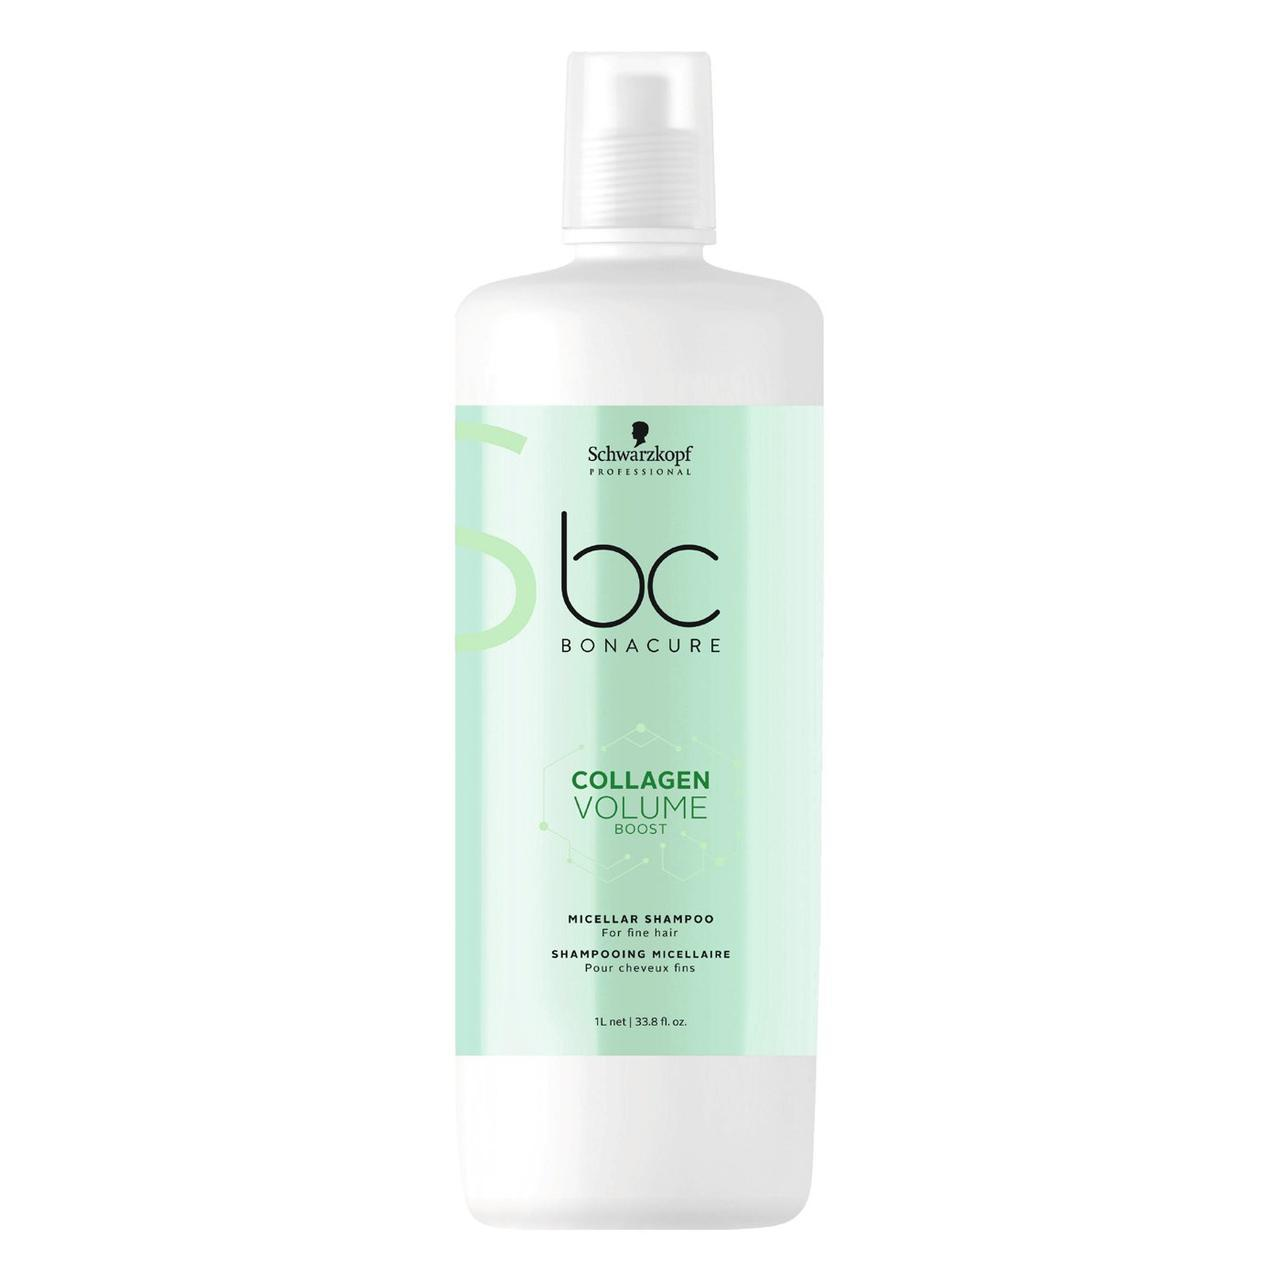 Мицеллярный шампунь для объёма SCHWARZKOPF BC Collagen Volume Boost Micellar Shampoo 1000 мл